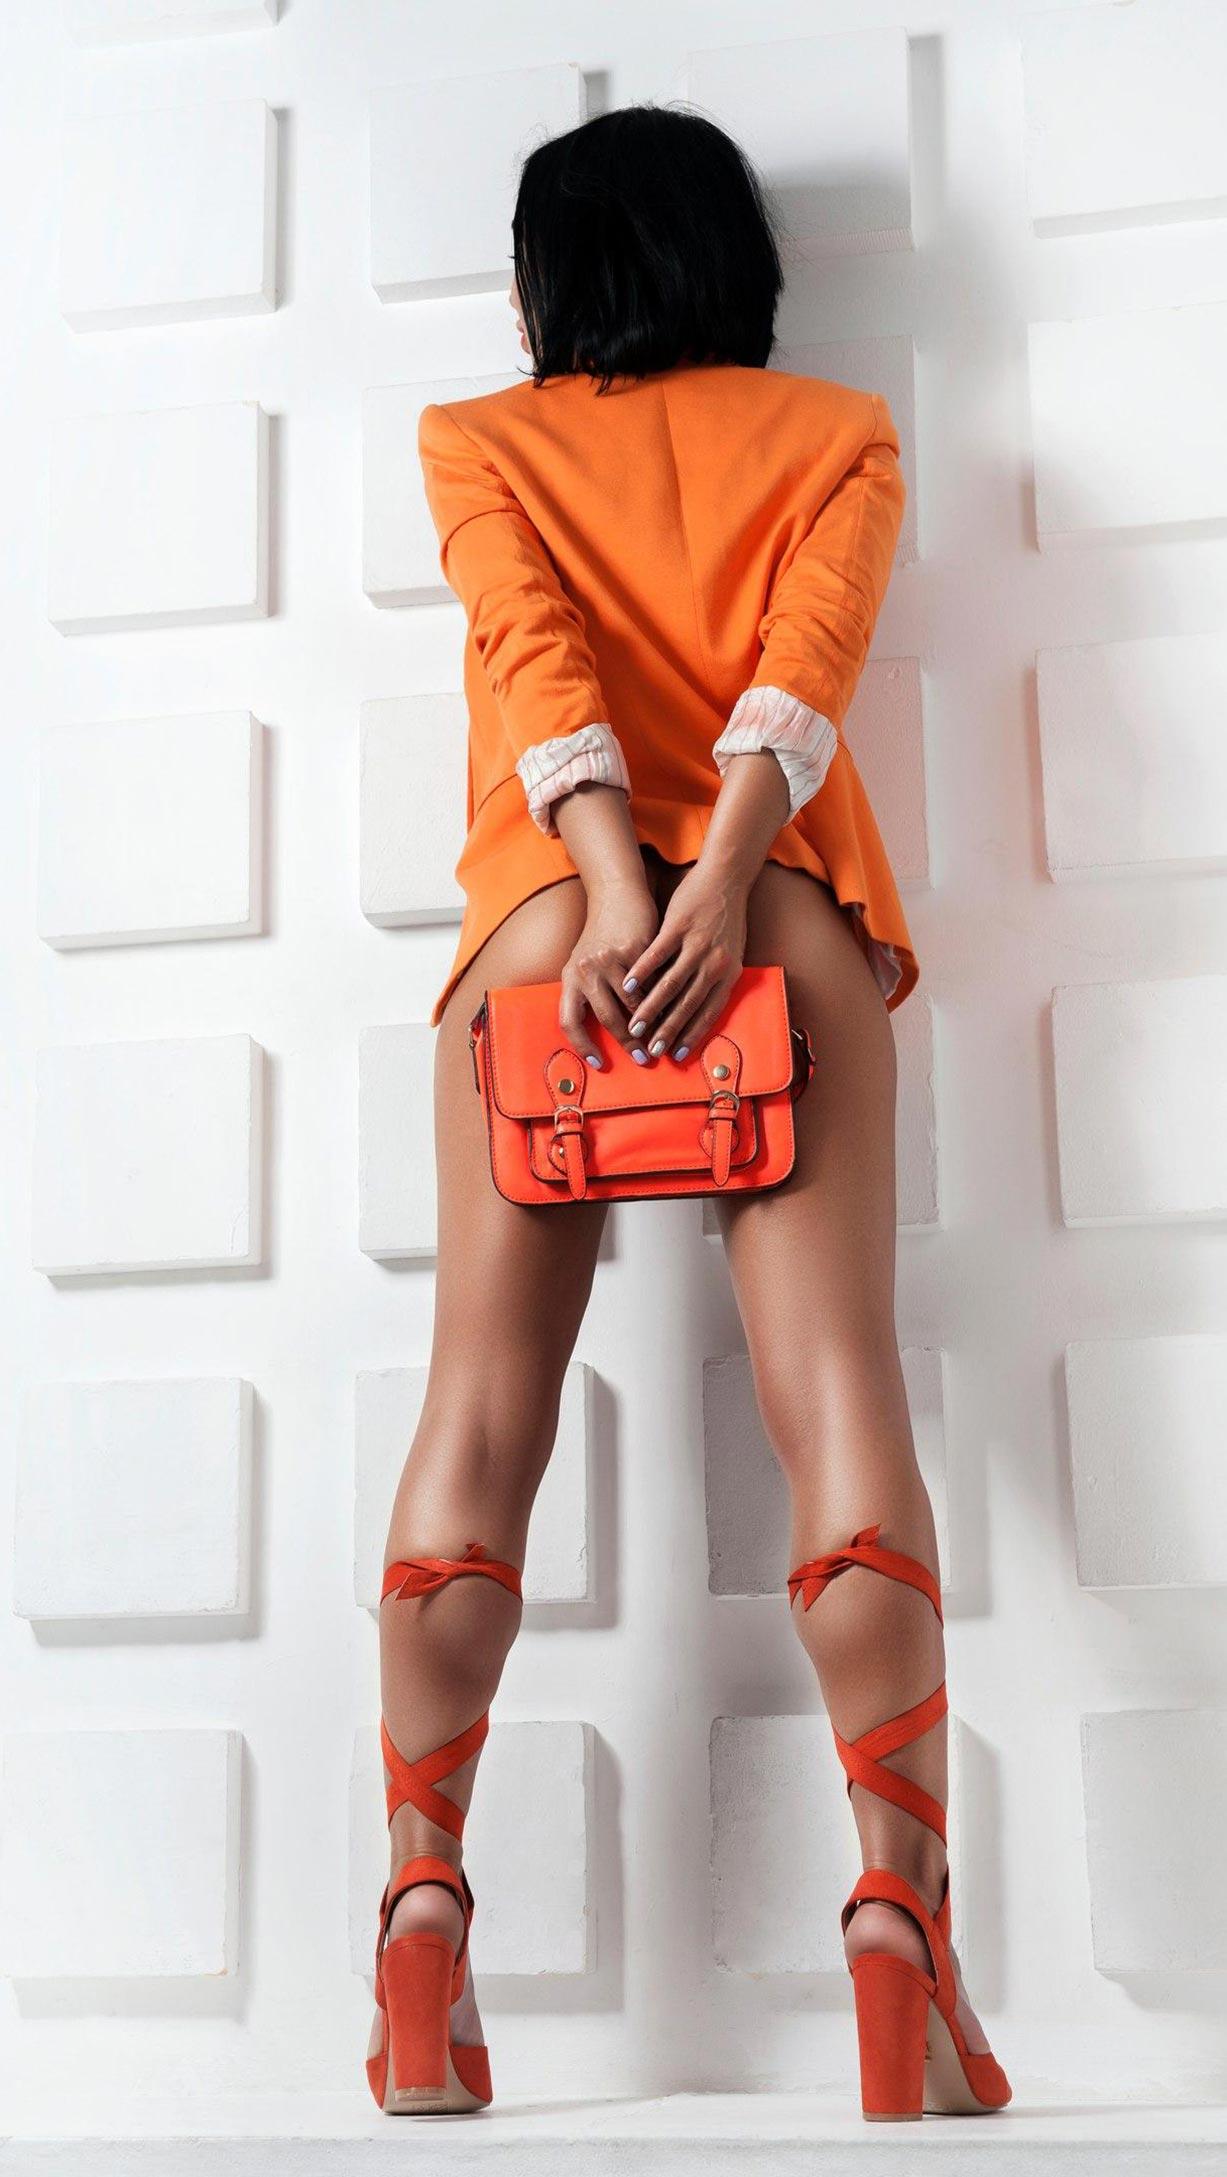 Олеся Левина и оранжевая мода / фото 05